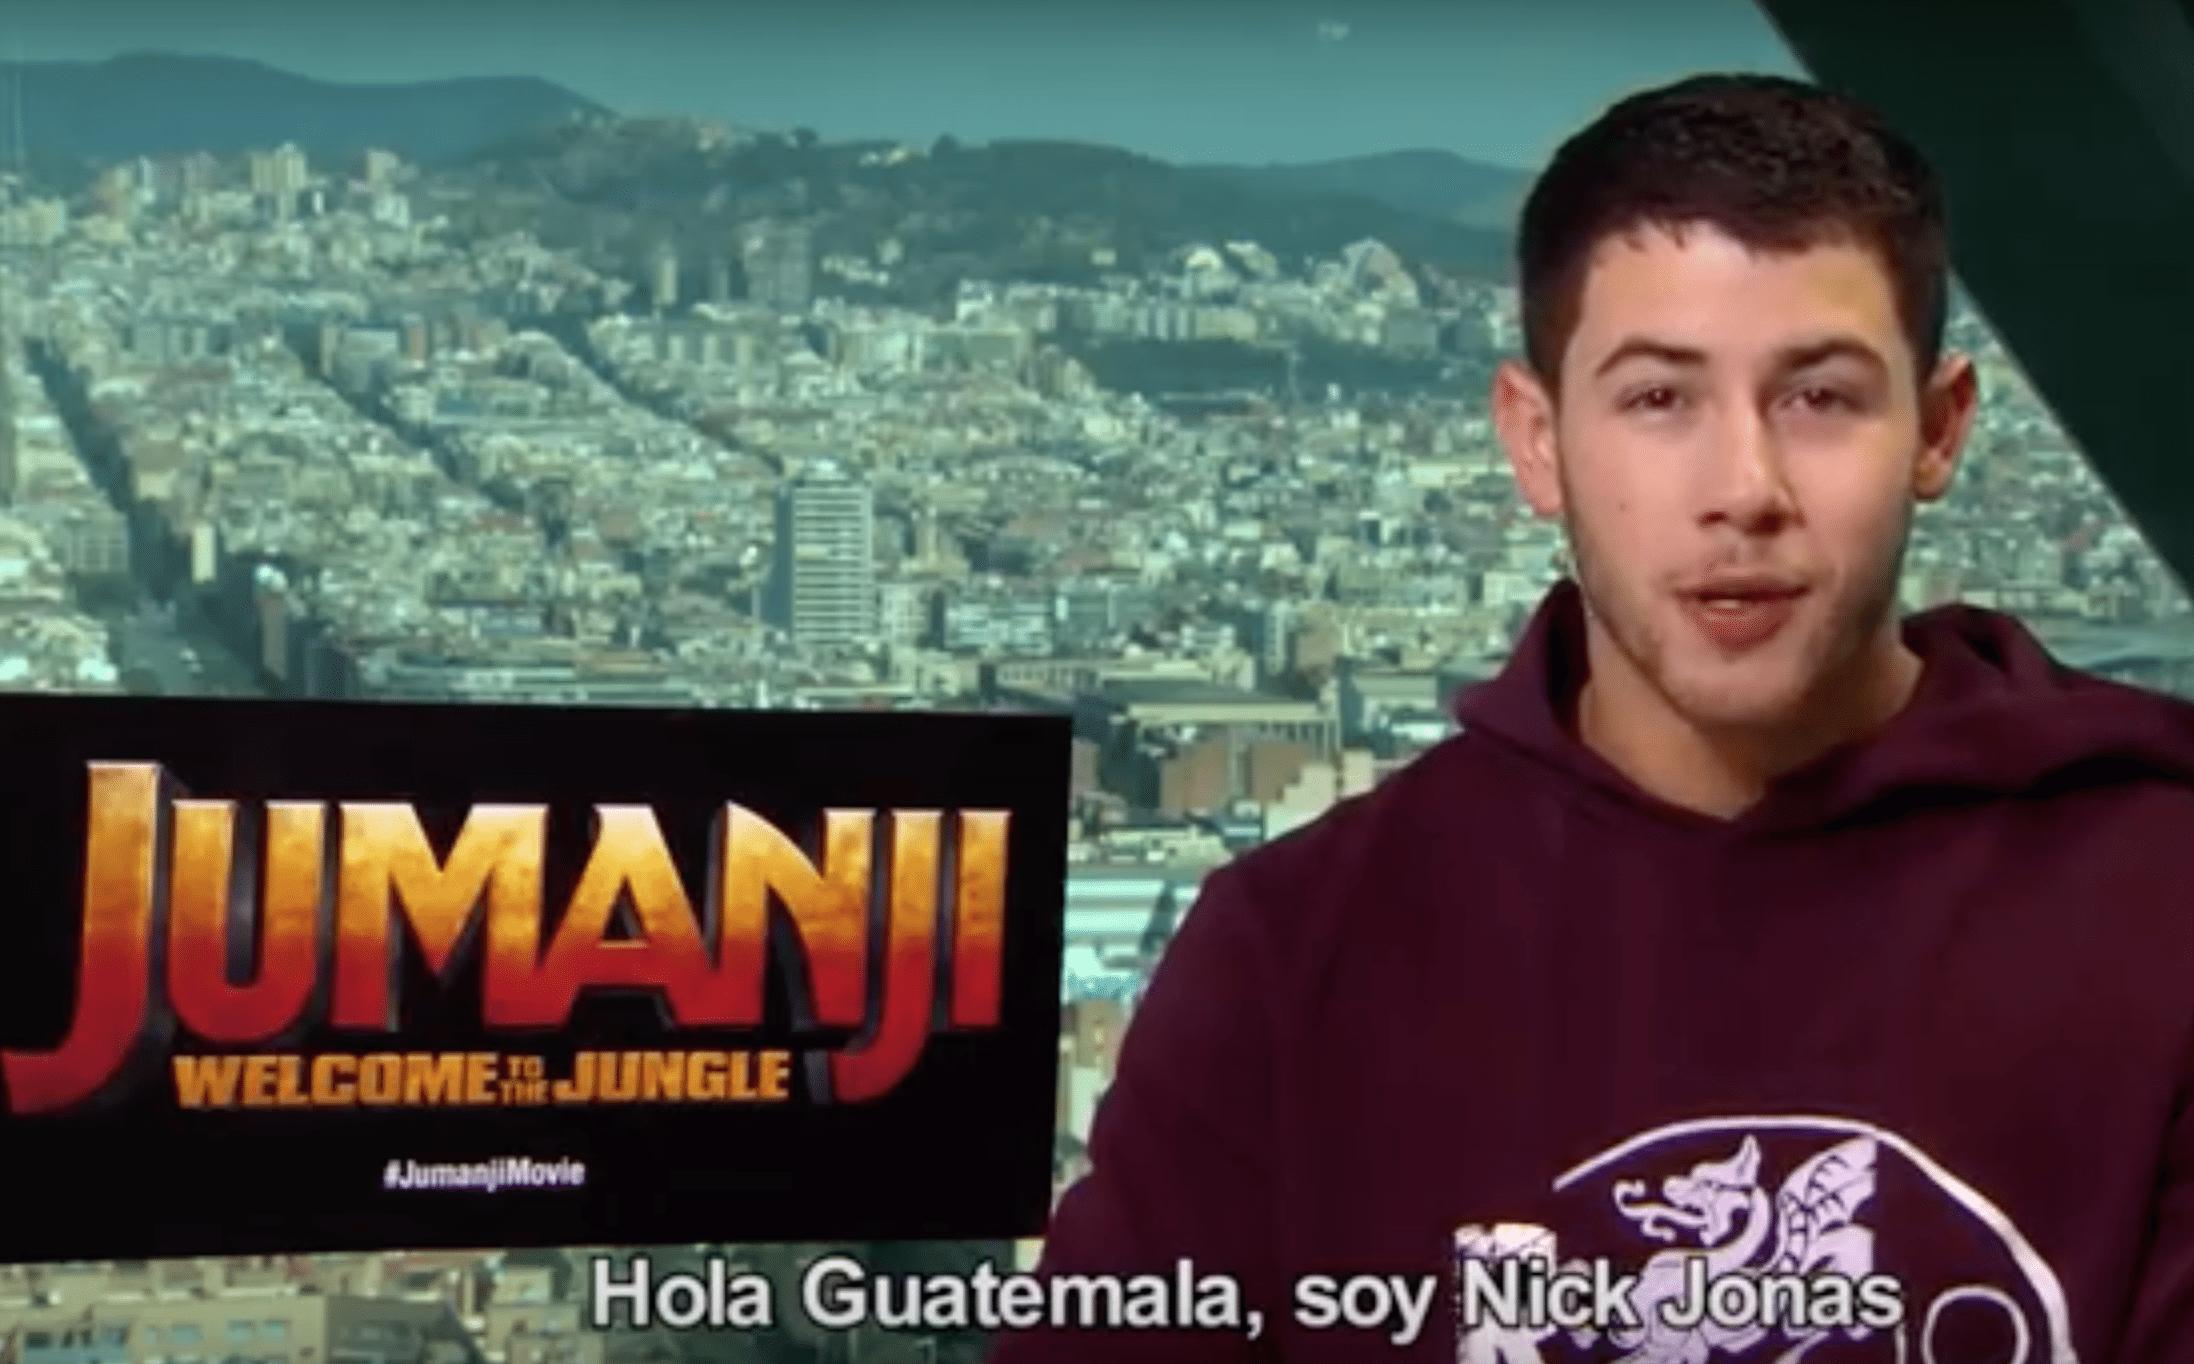 nick jonas-guatemala-saludo-jumanji